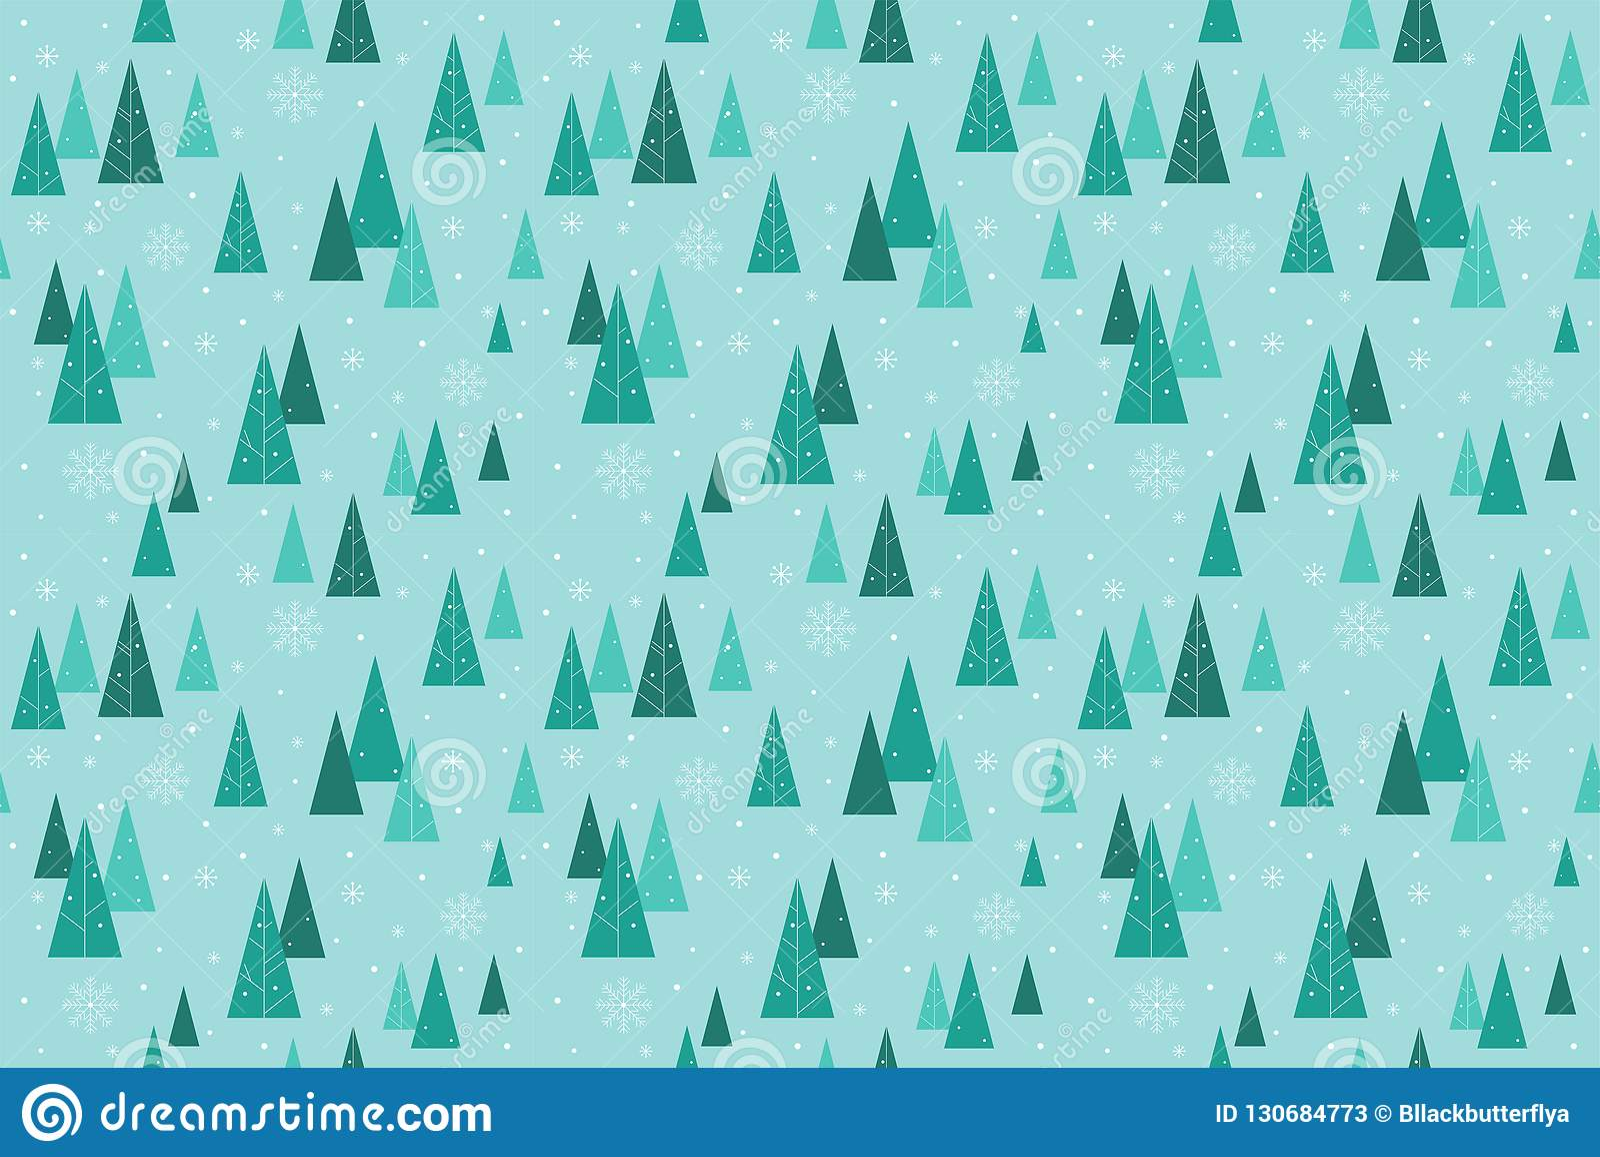 merry christmas pattern seamless tree wallpaper blue xmas back merry christmas pattern seamless tree wallpaper blue xmas 130684773